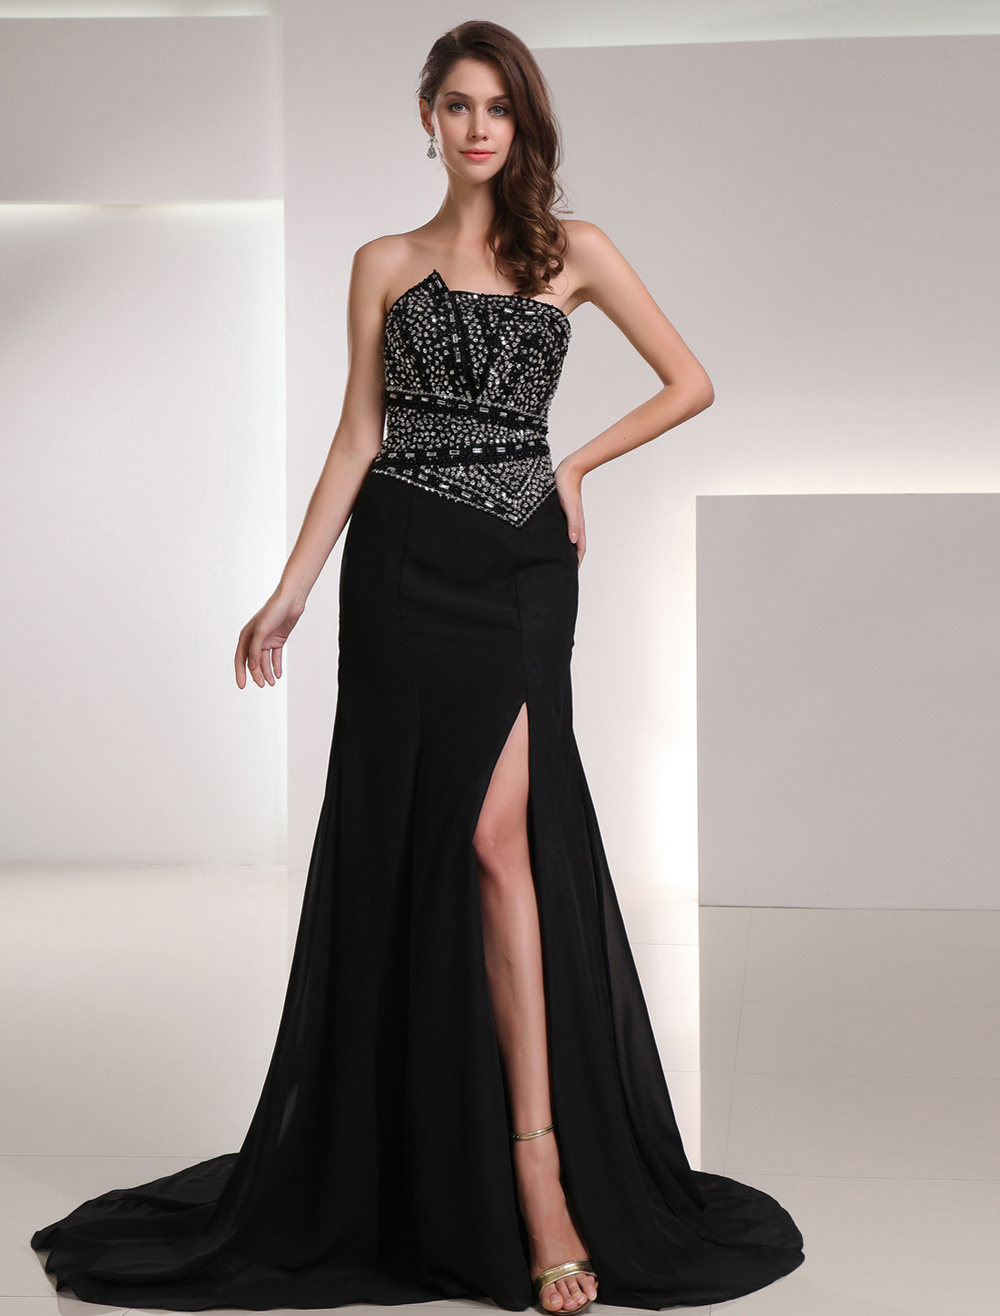 Black Chiffon Split Front Strapless Evening Dress (Wedding Evening Dresses) photo